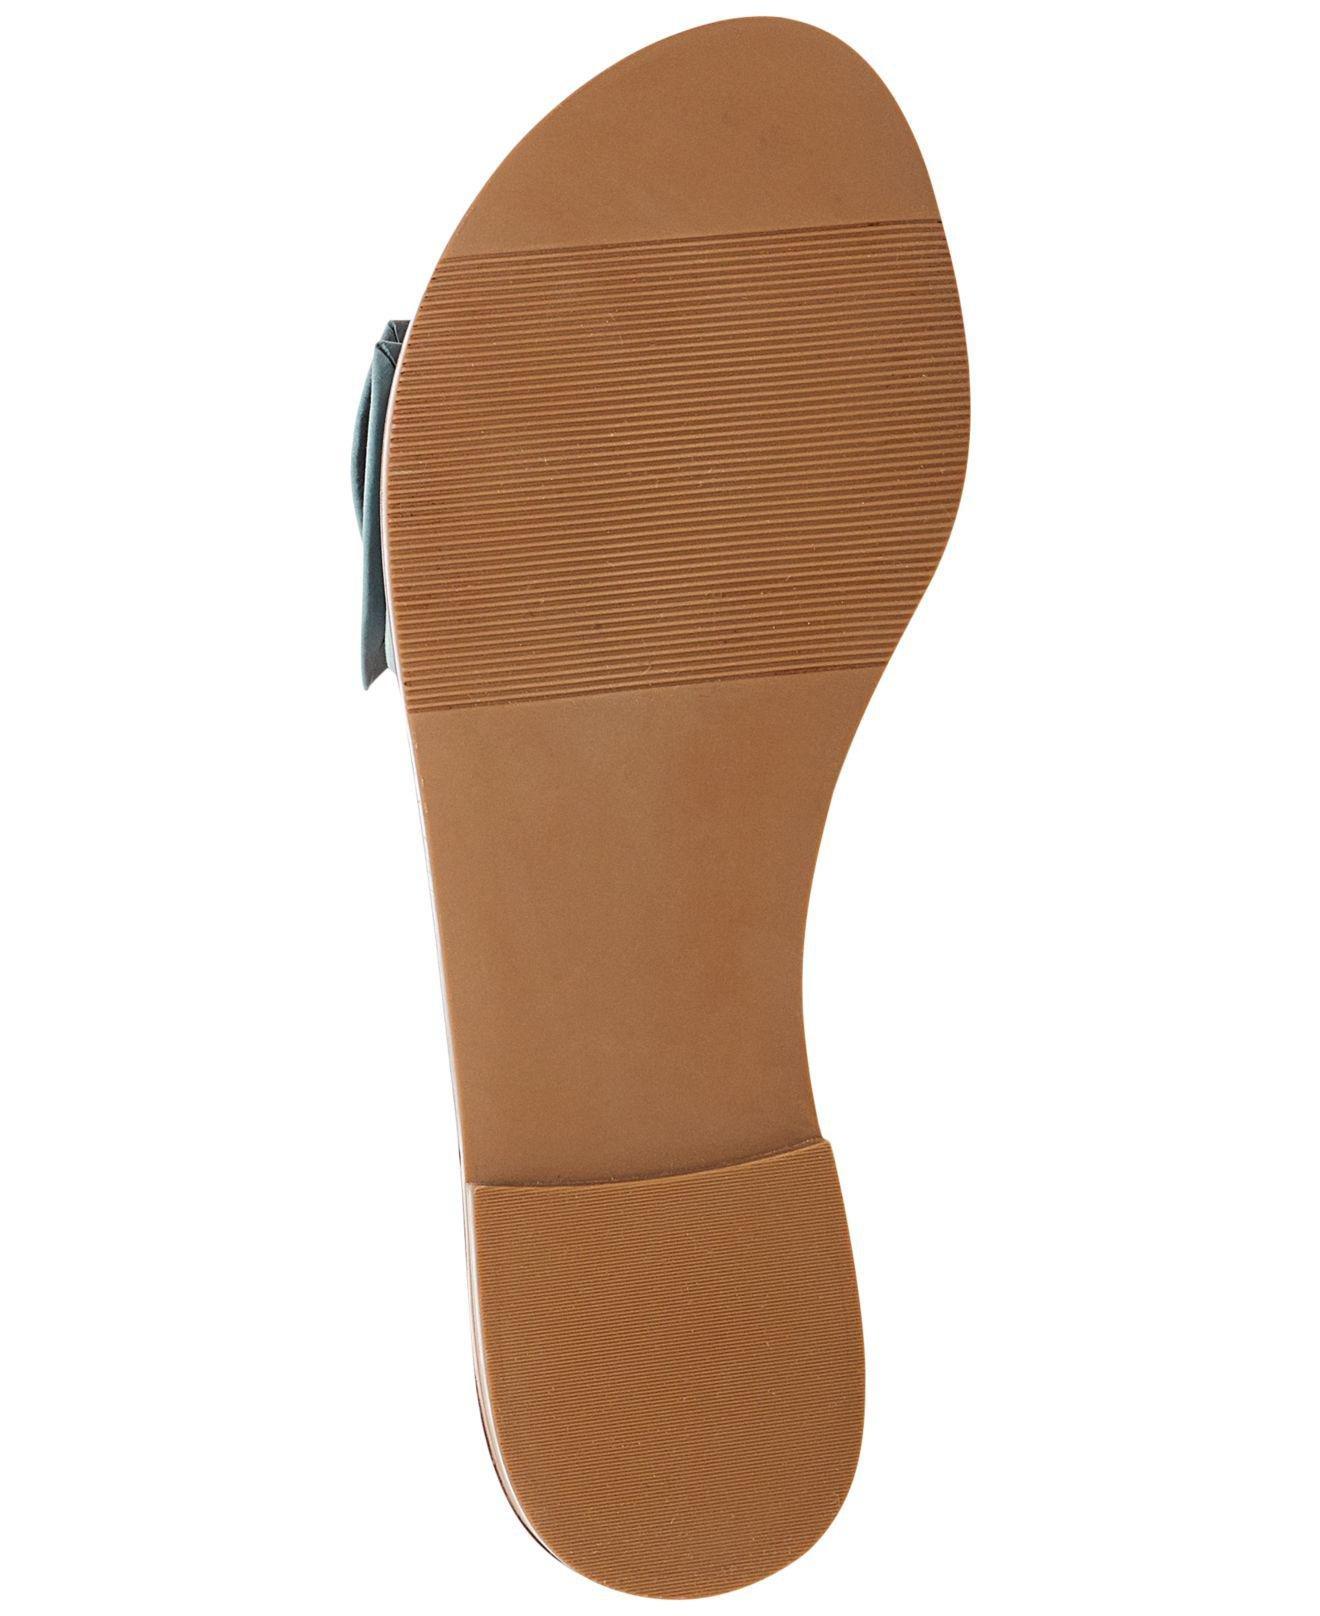 5f49d39c8f0609 Lyst - Steve Madden Women s Knotss Bow Sandals in Blue